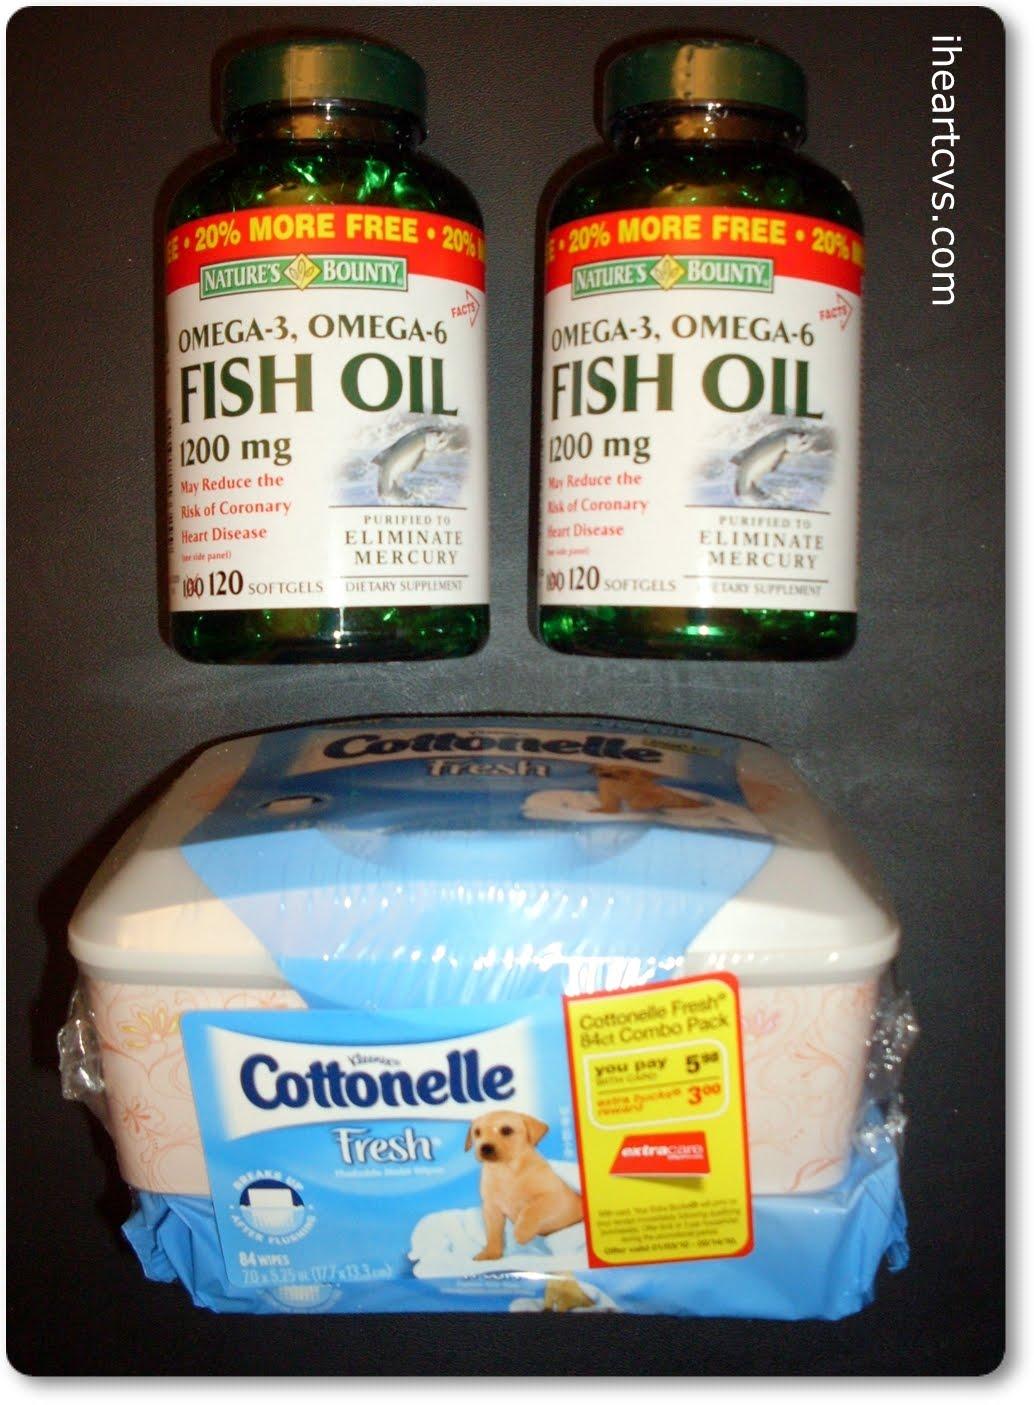 Cvs trippin 02 12 cottonelle nature 39 s bounty for Cvs fish oil